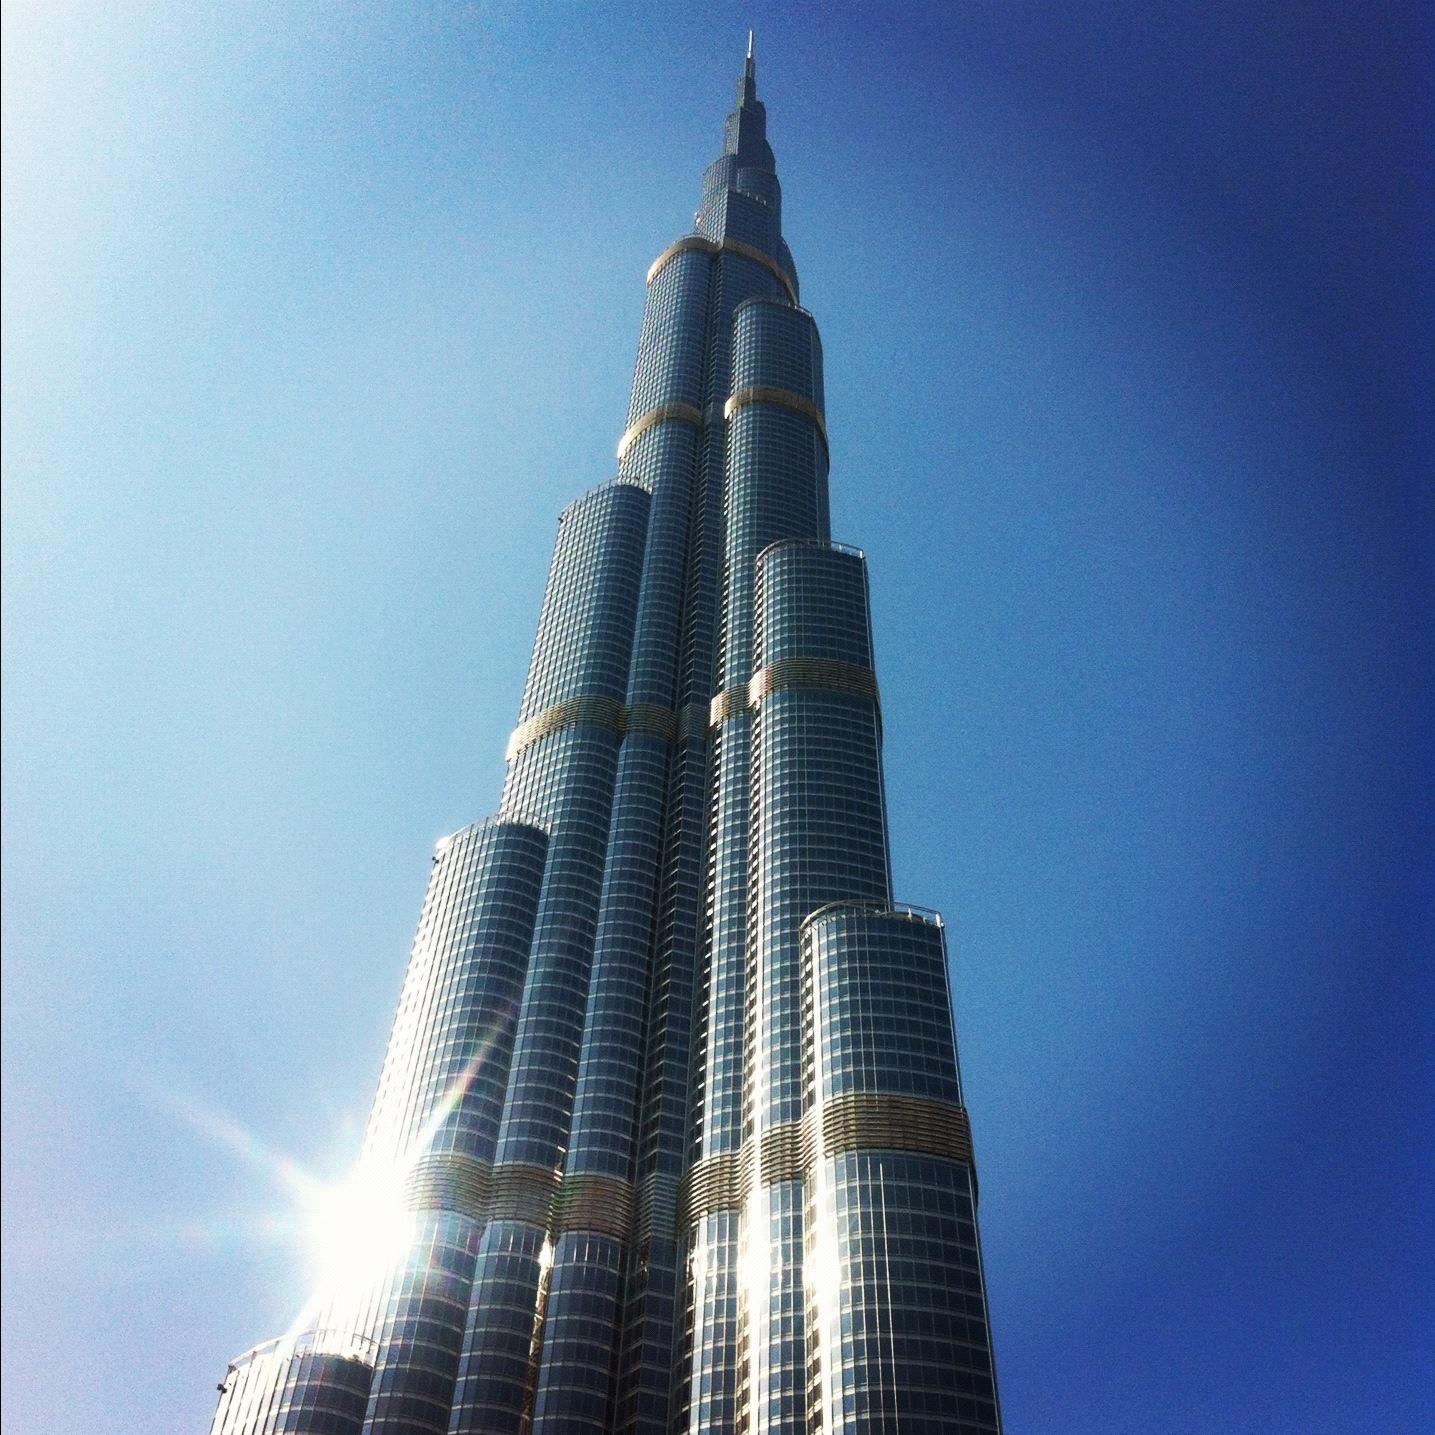 Burj Khalifa Fresh Hd Wallpaper 2013 World Hd Wallpapers